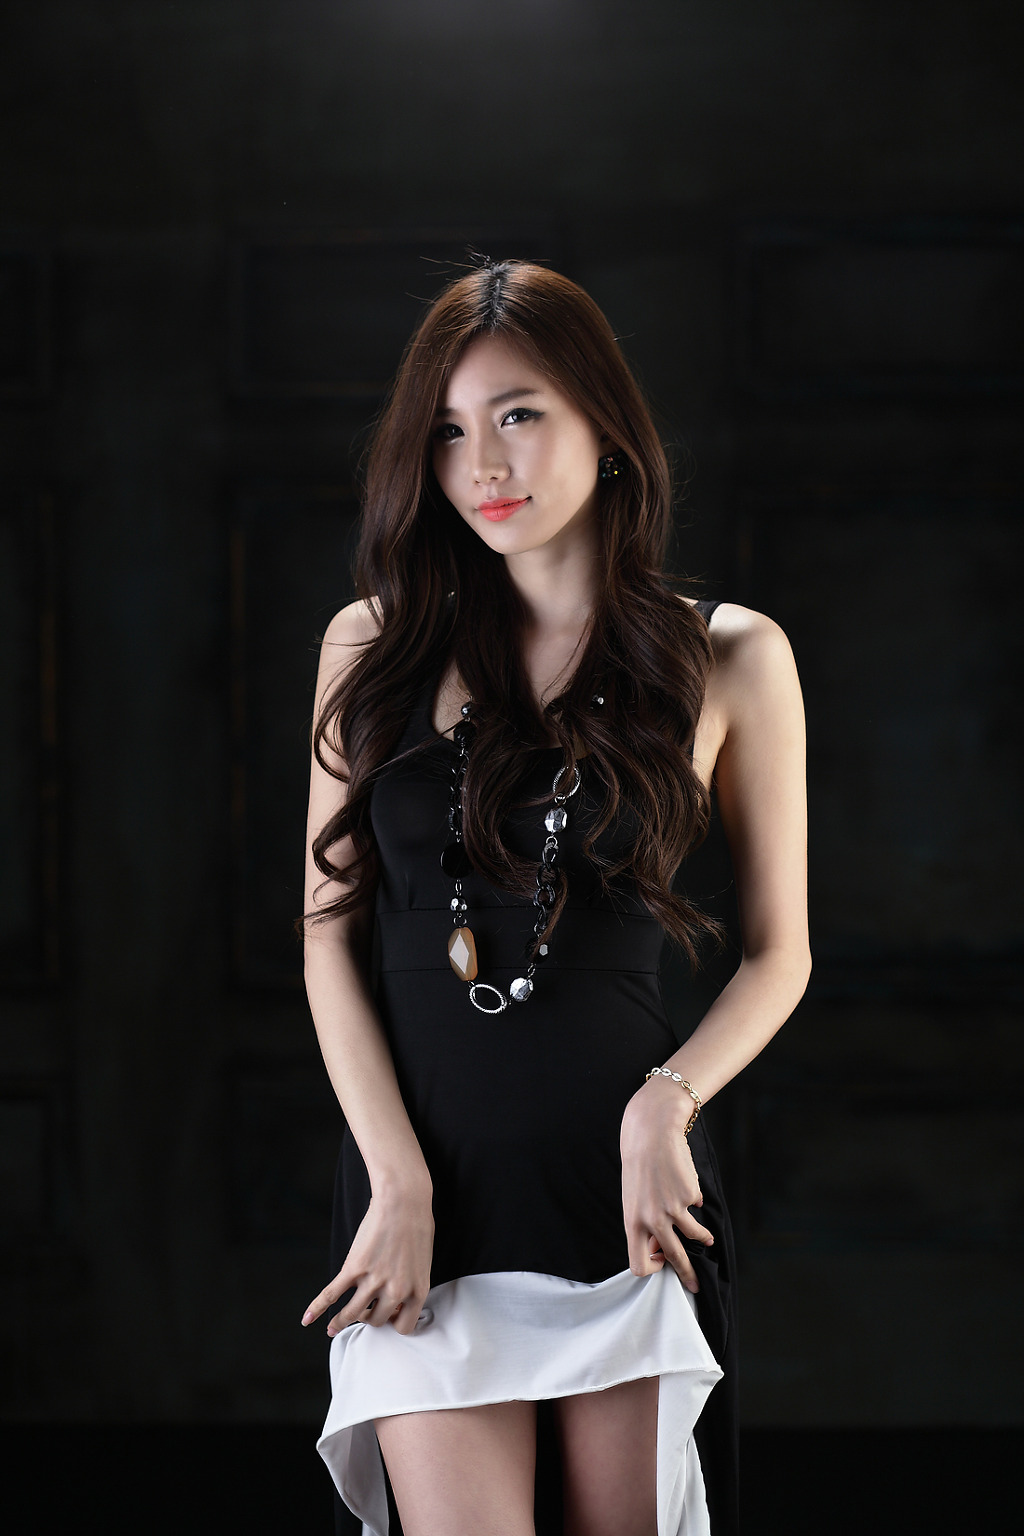 1000+ Amazing Chinese Girl Photos · Pexels · Free Stock Photos